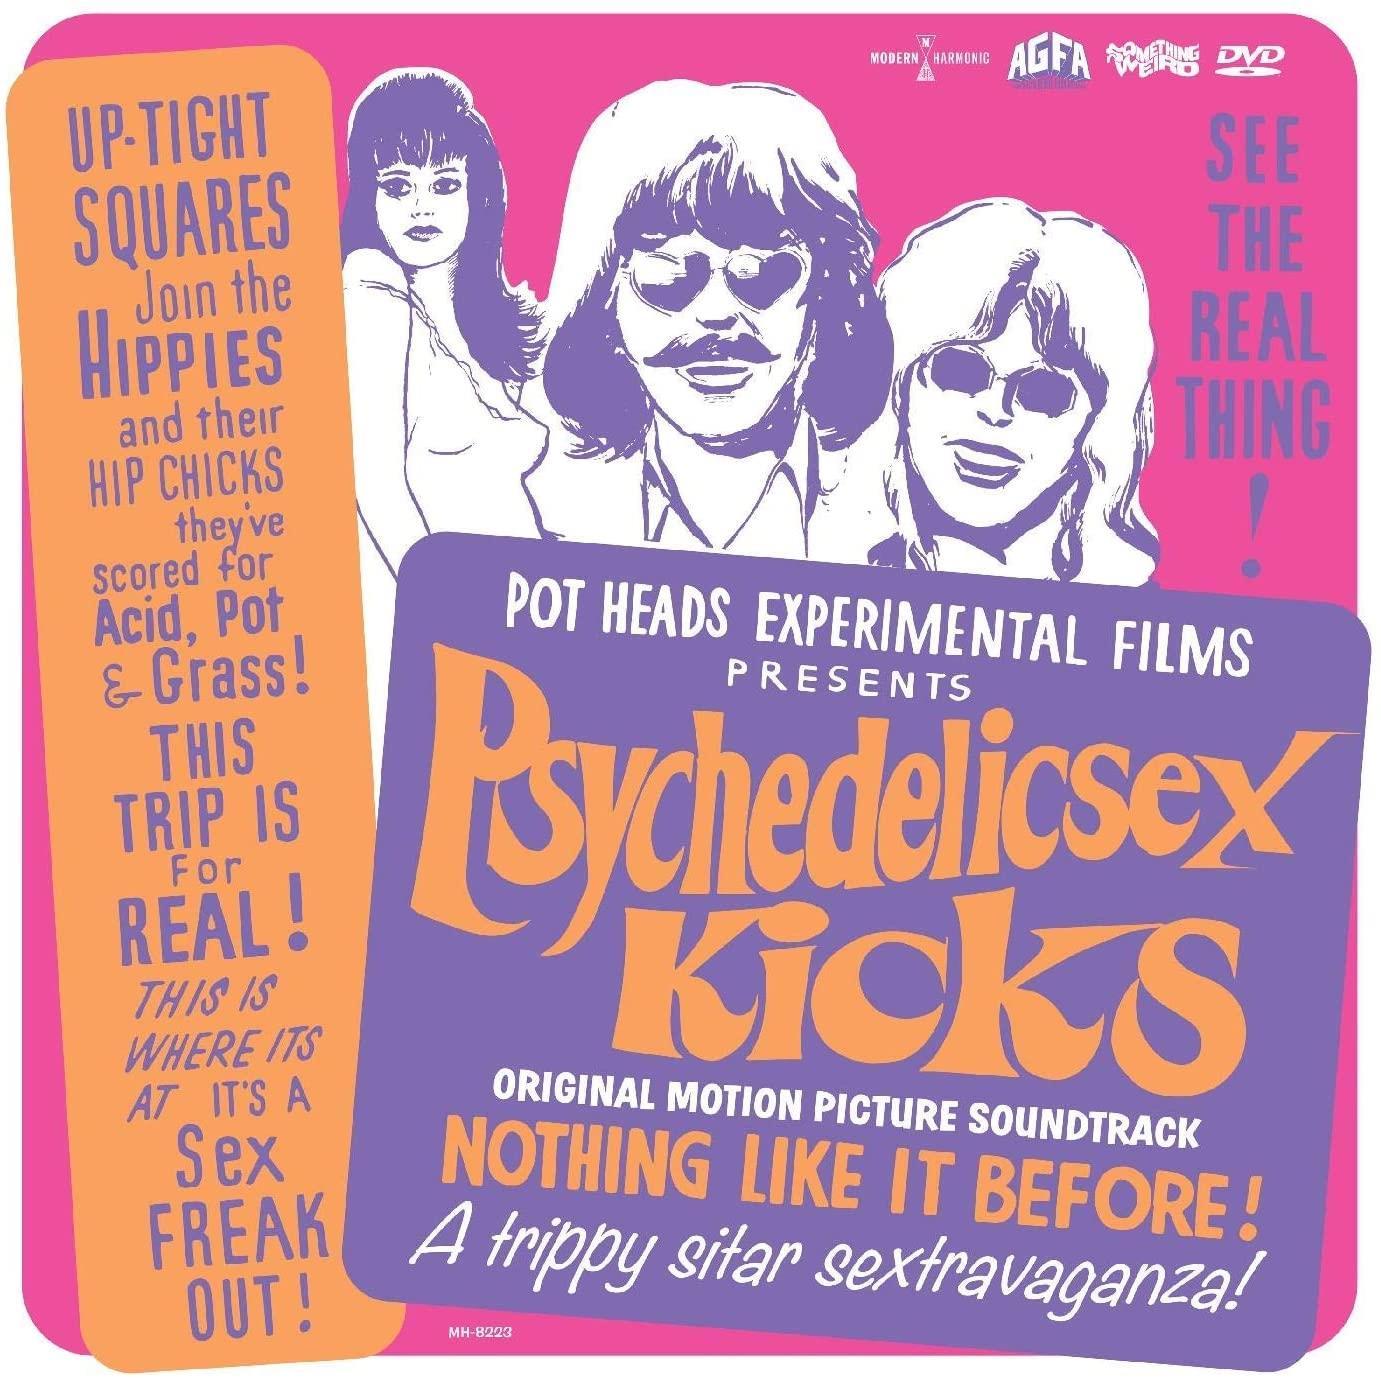 Original Soundtrack - Psychedelic Sex Kicks [LP+DVD]